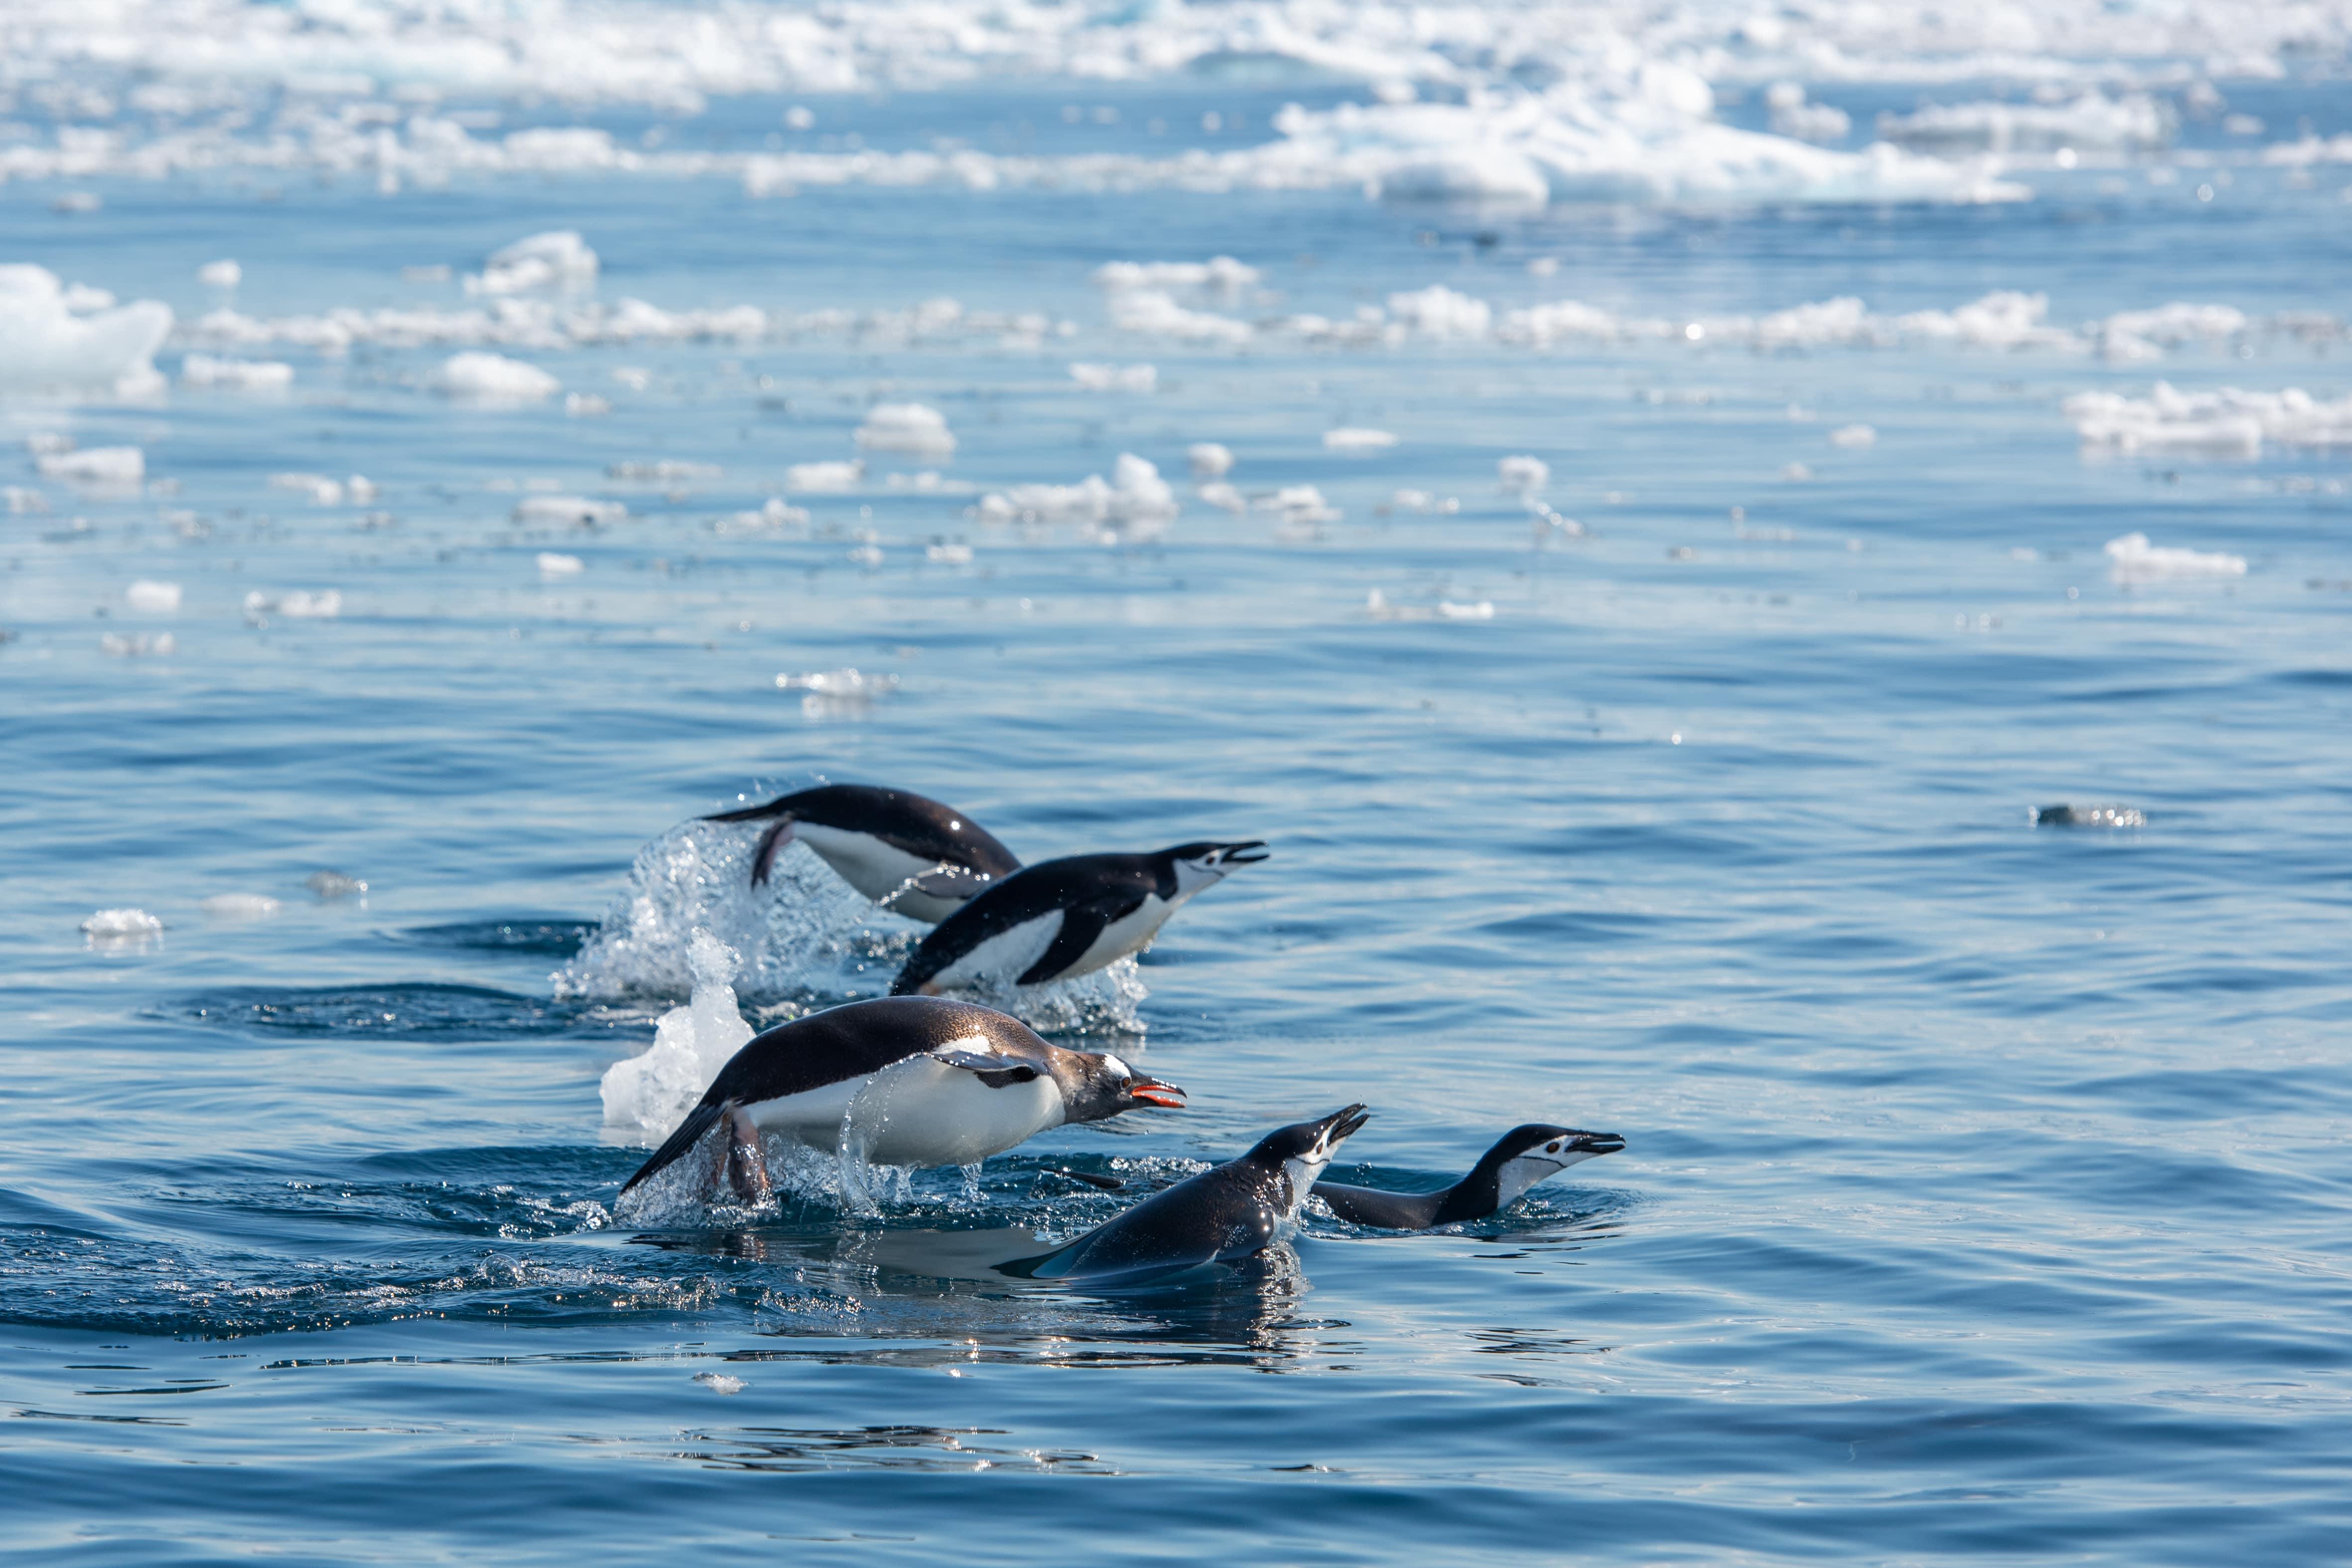 Penguins swimming off the coast of the Antarctic Peninsula. Photo by Jordi Chias, National Geographic Pristine Seas.